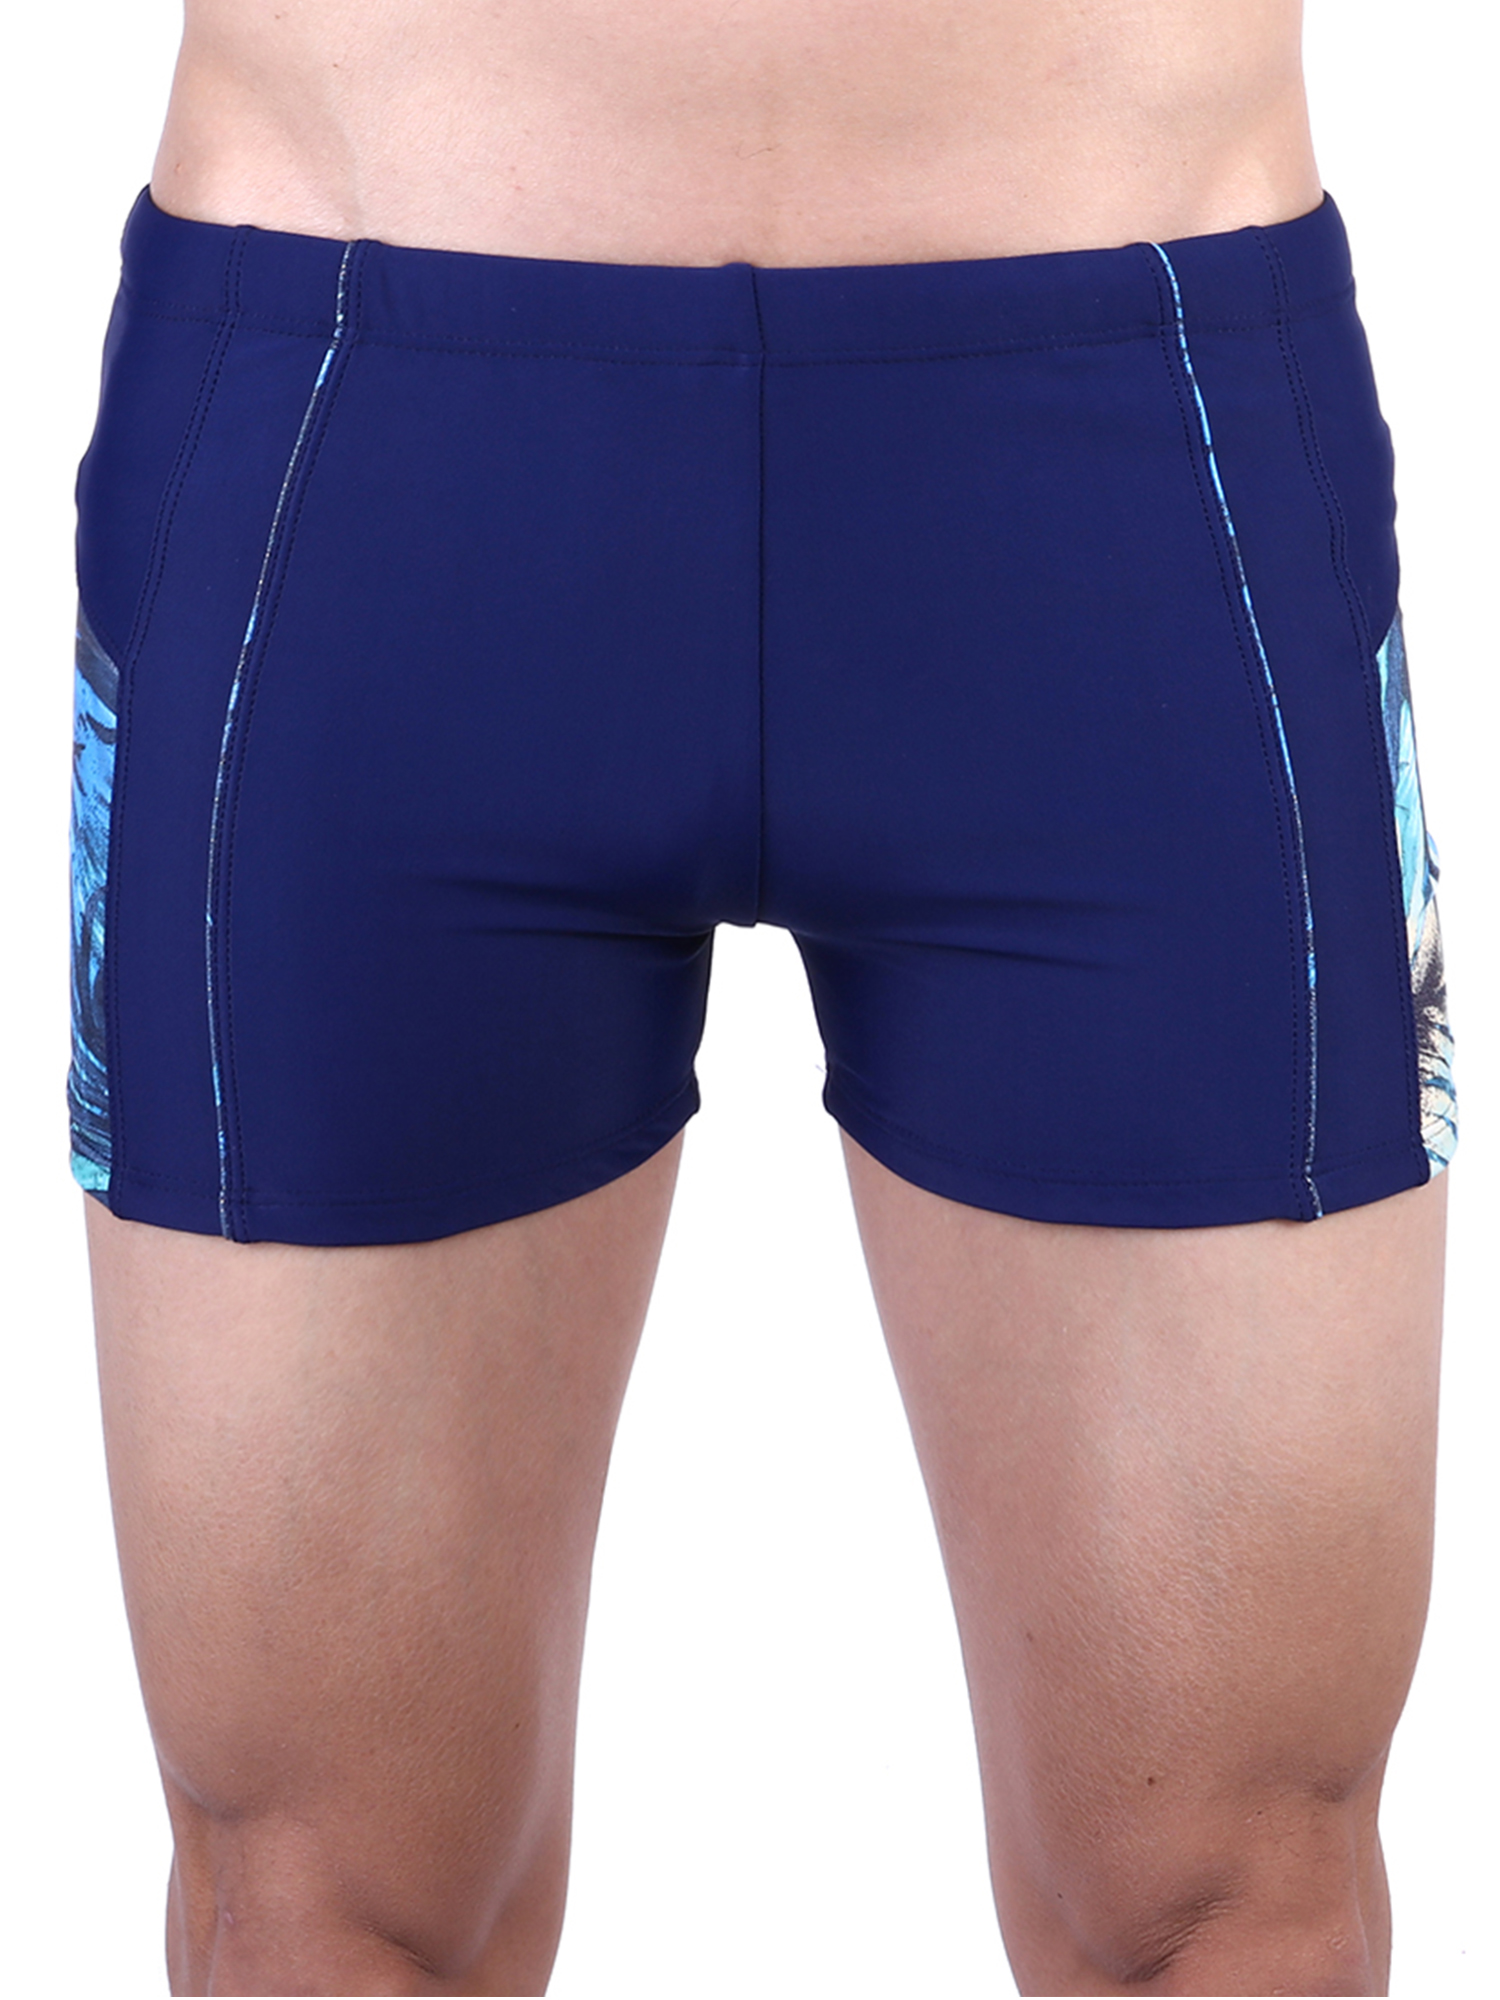 Transser Basketball Shorts for Men Sports Running Outdoor Lightweight Hiking Shorts Swim Trunks Quick Dry Short